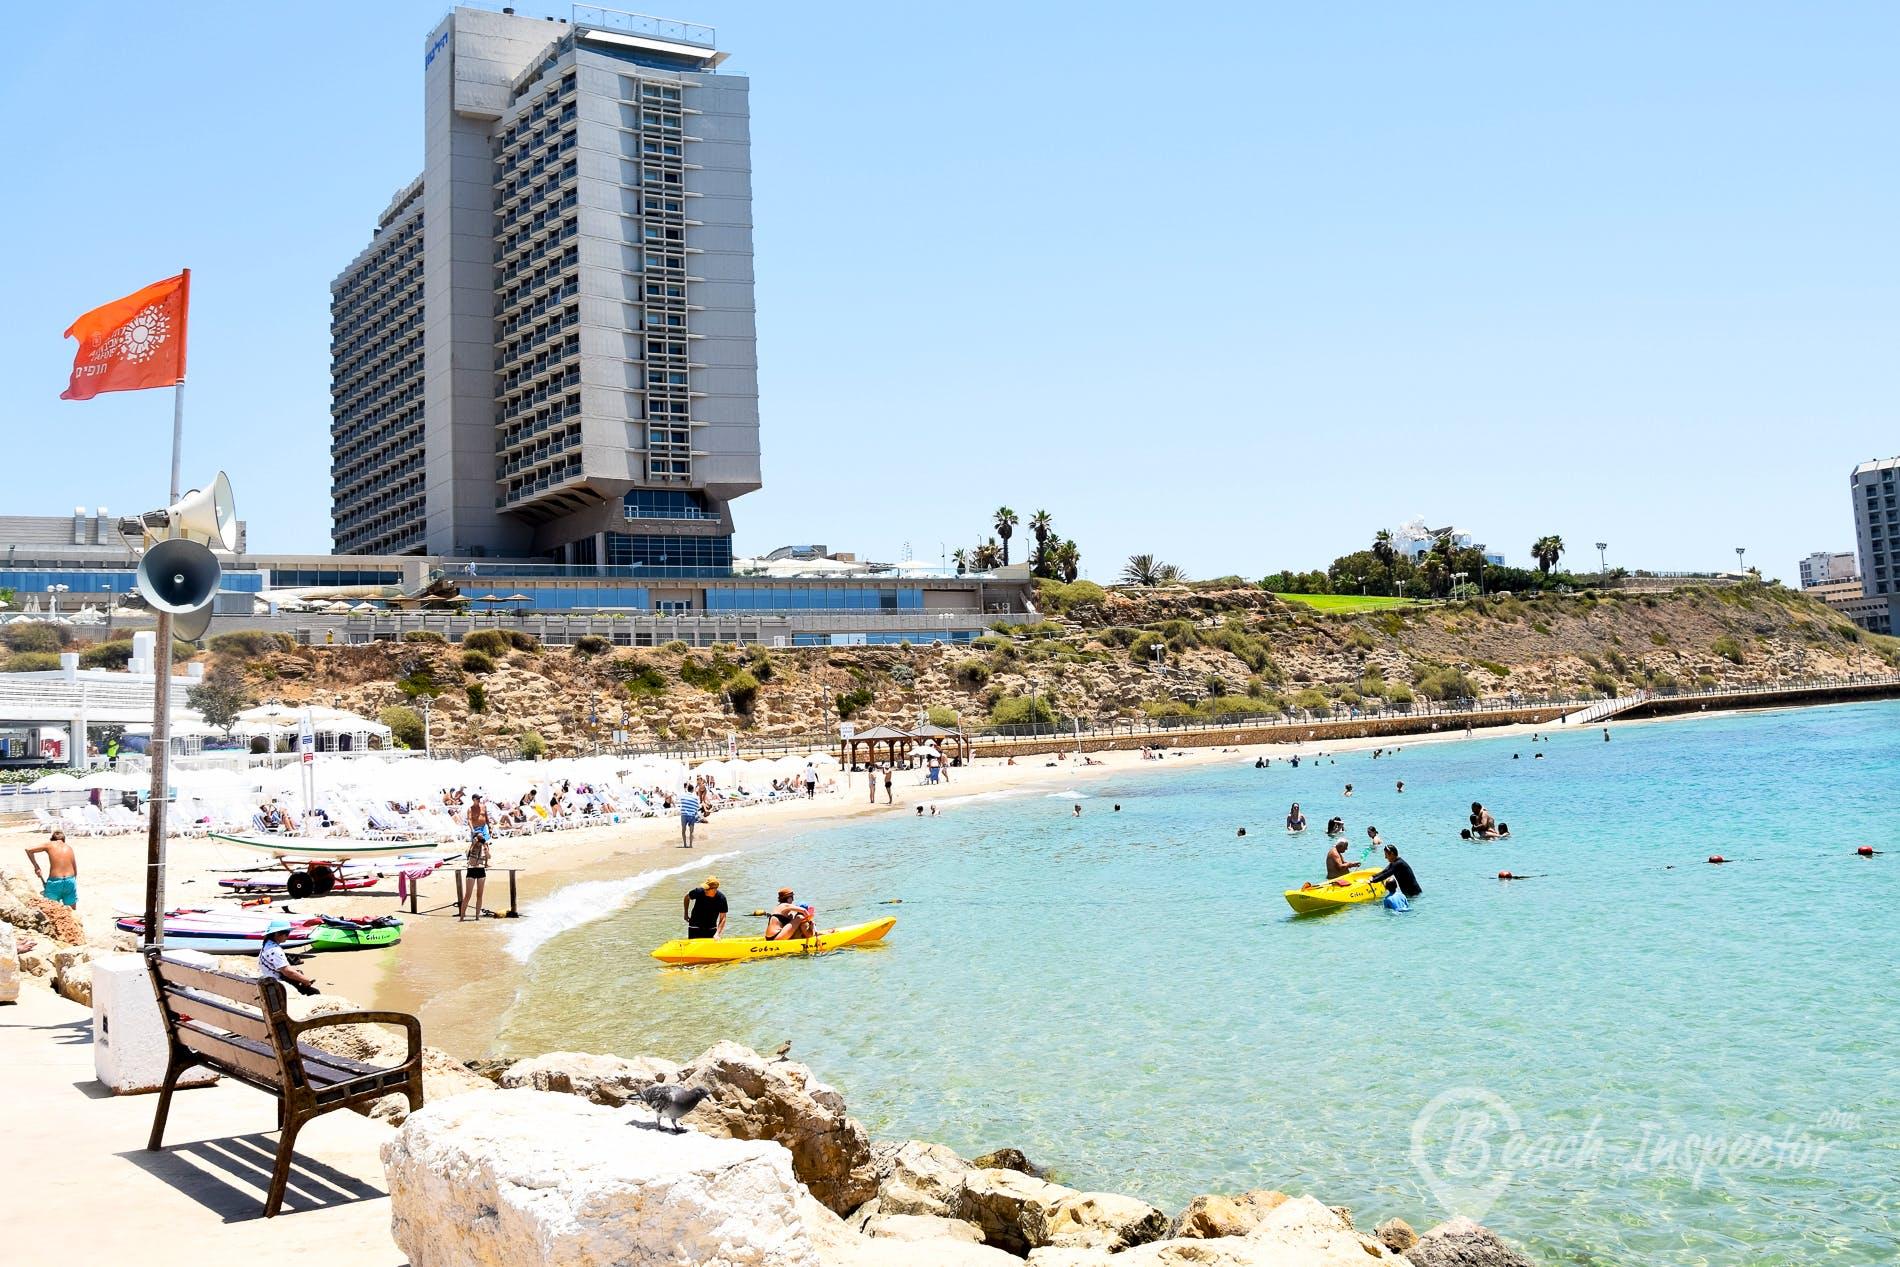 Strand Hilton Beach, Israel, Israel